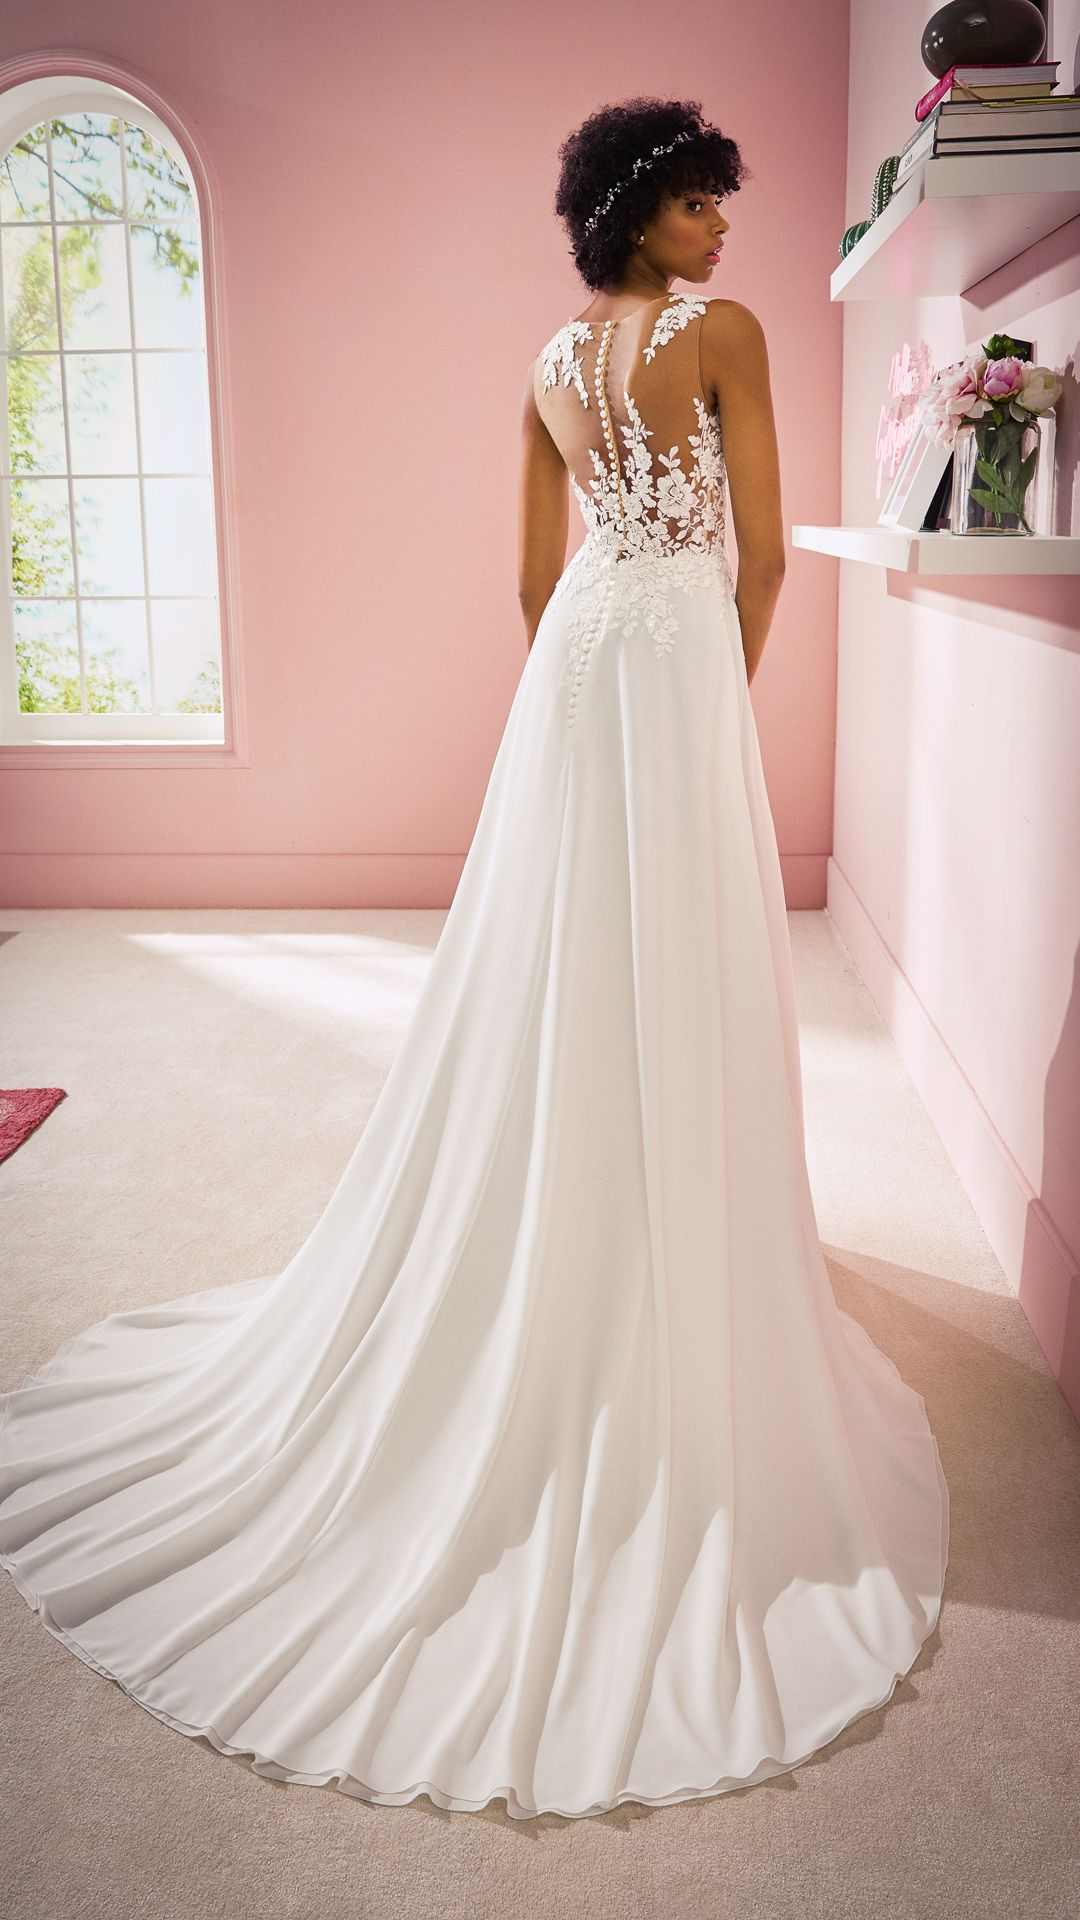 Hochzeitskleider 10 White One Kollektion Modell: AMA-C